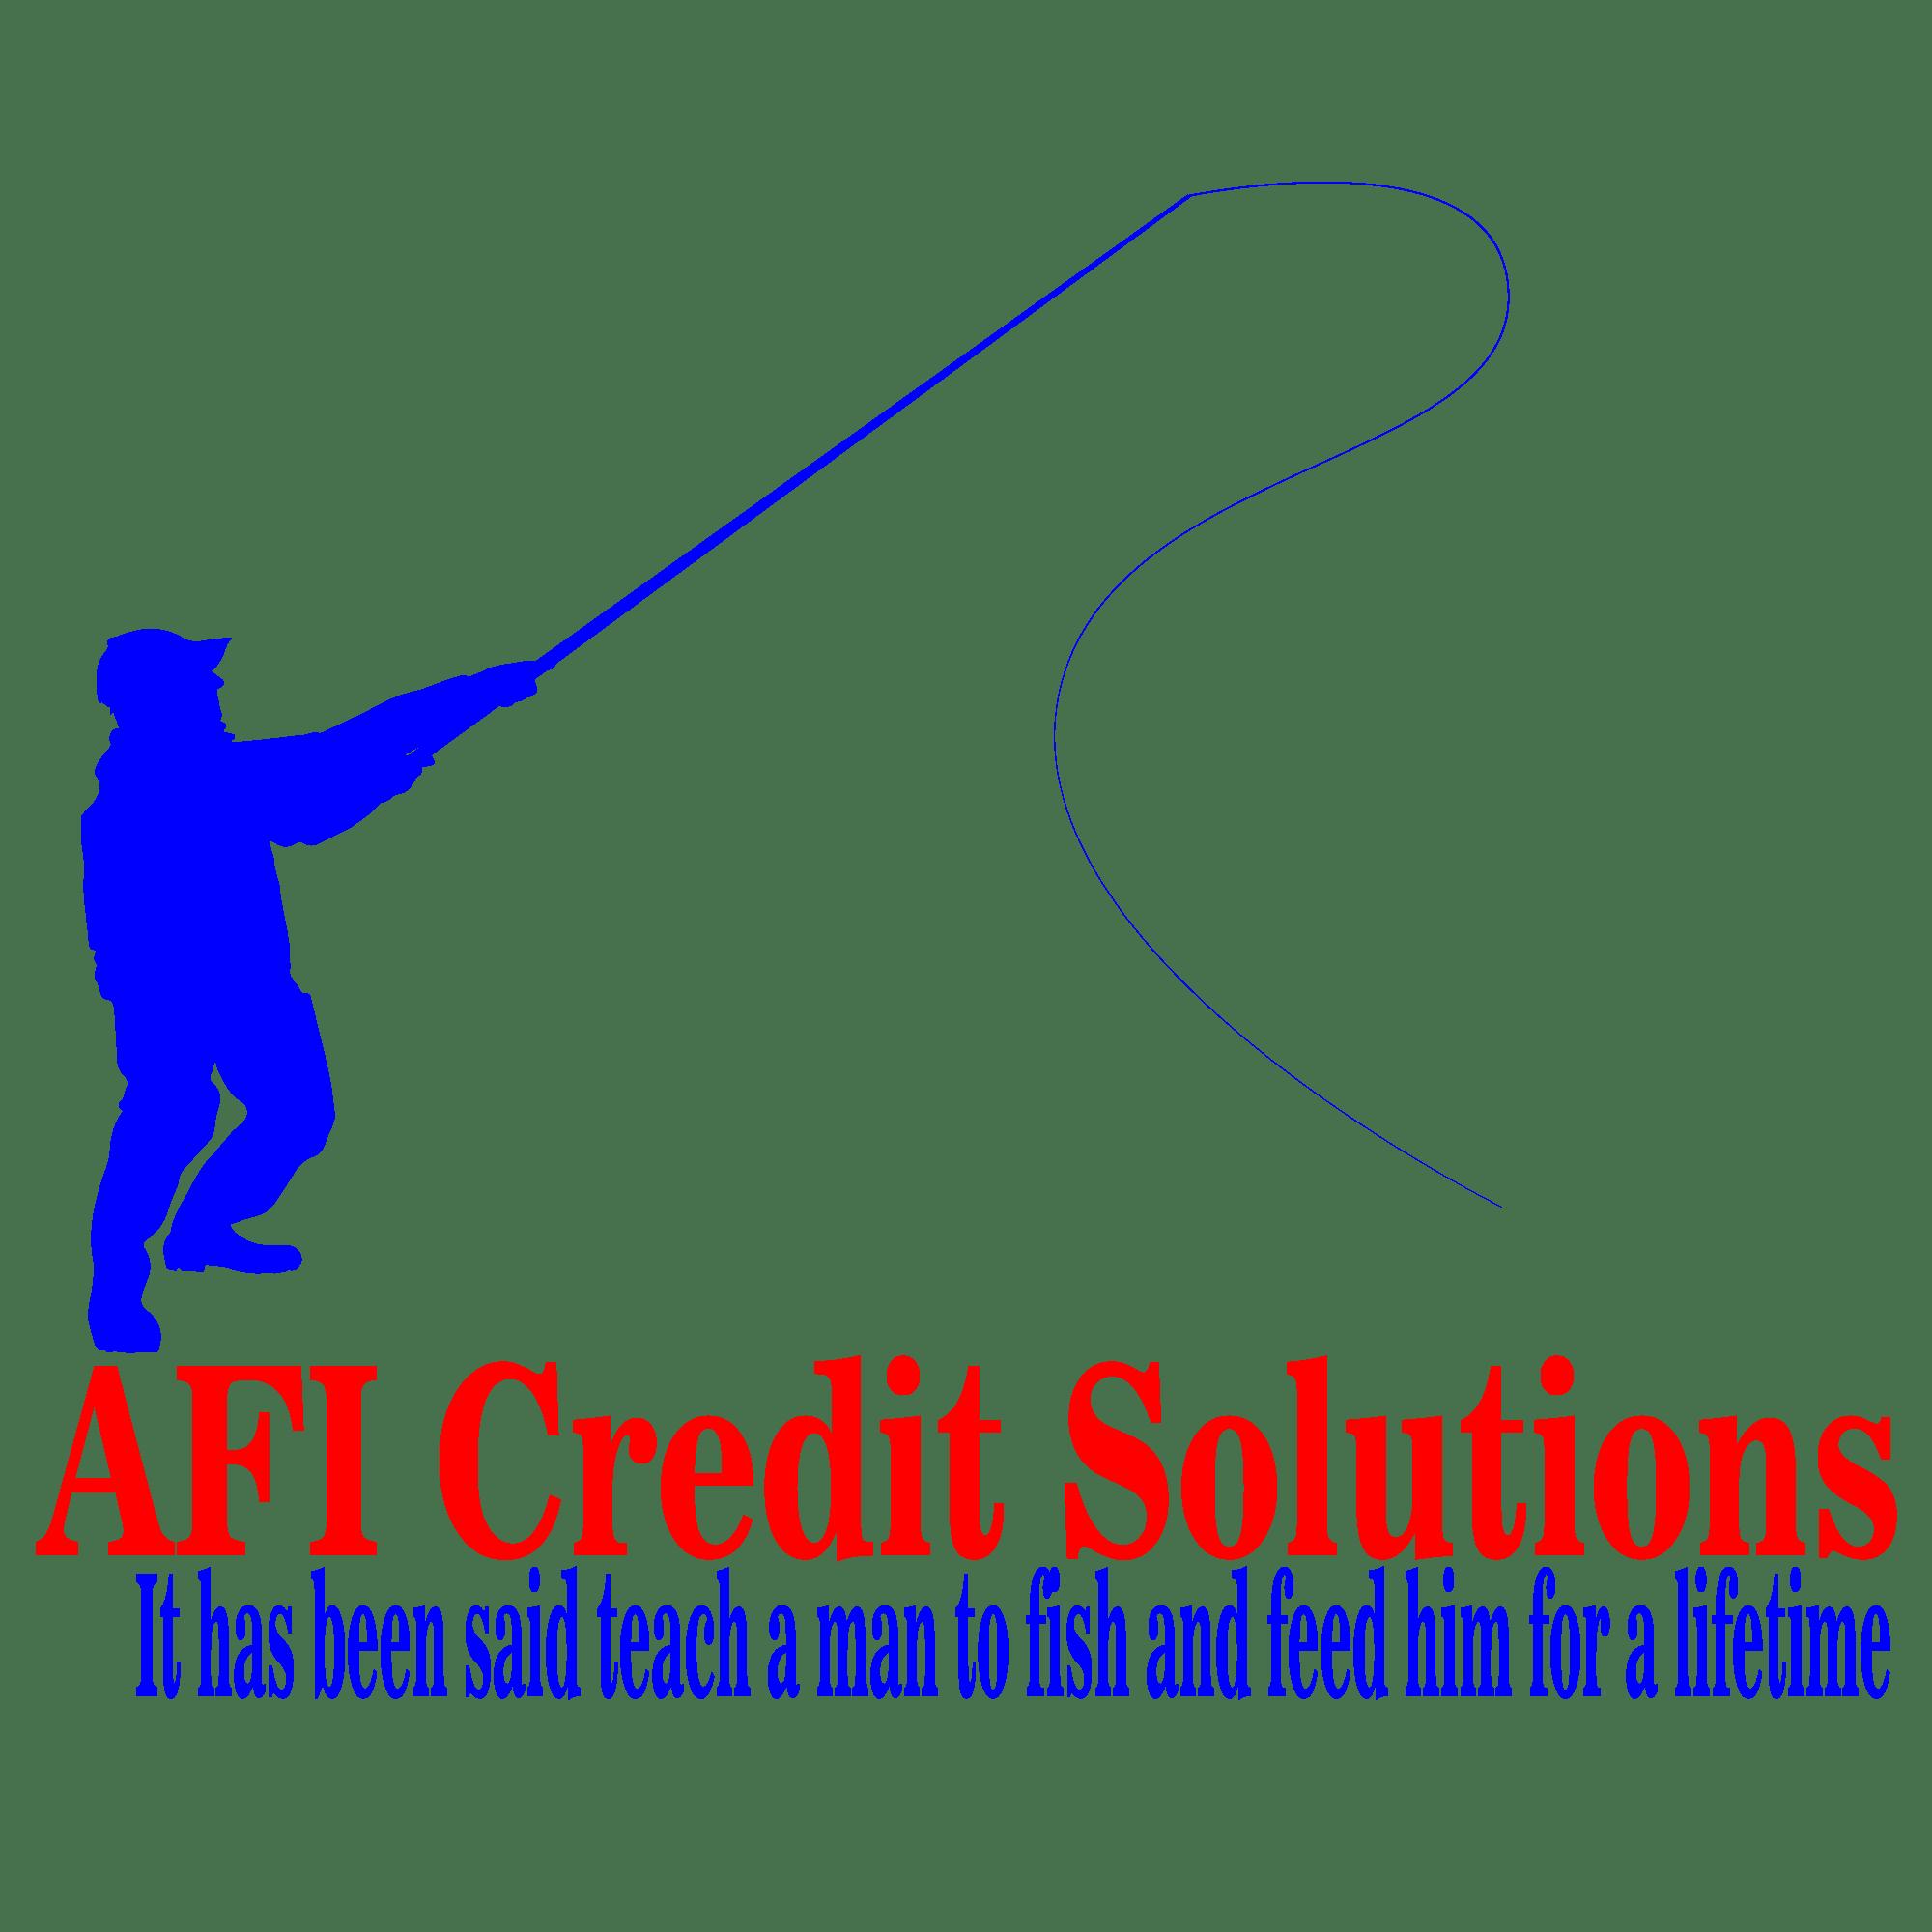 AFI Credit Solutions